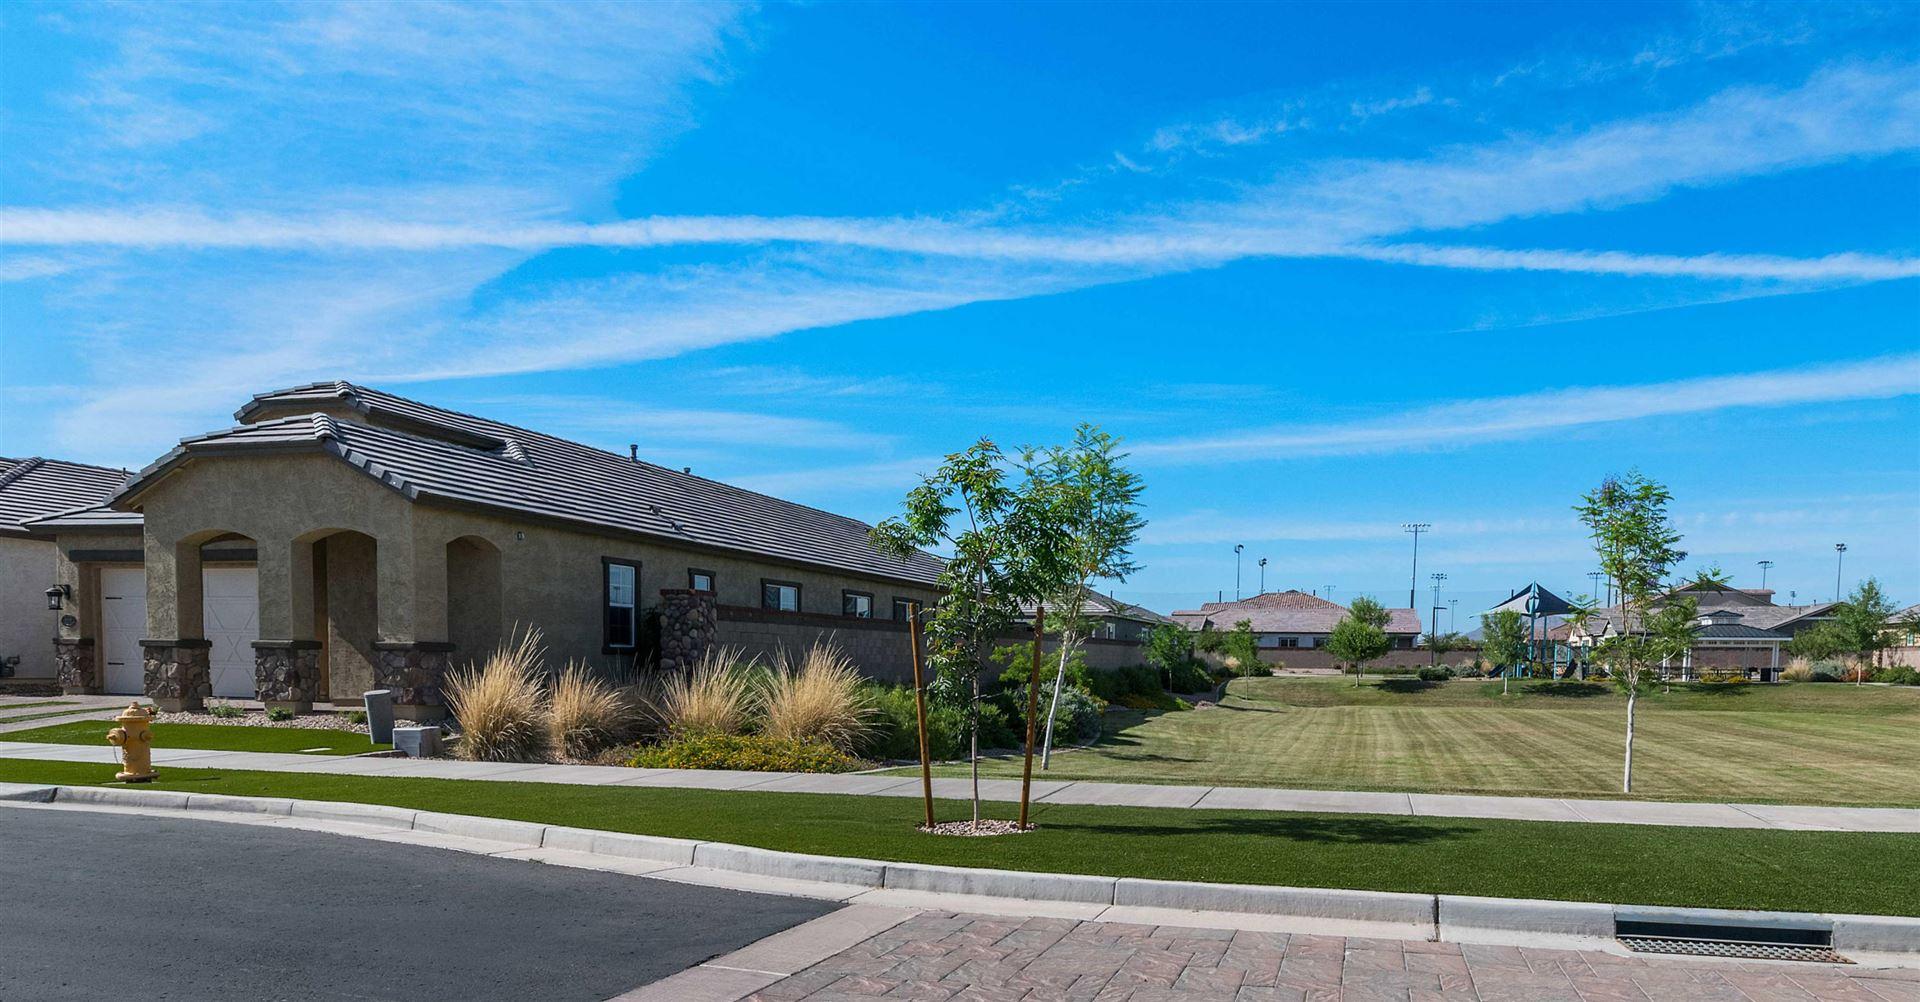 Photo of 10116 E NICHOLS Avenue, Mesa, AZ 85209 (MLS # 6224348)